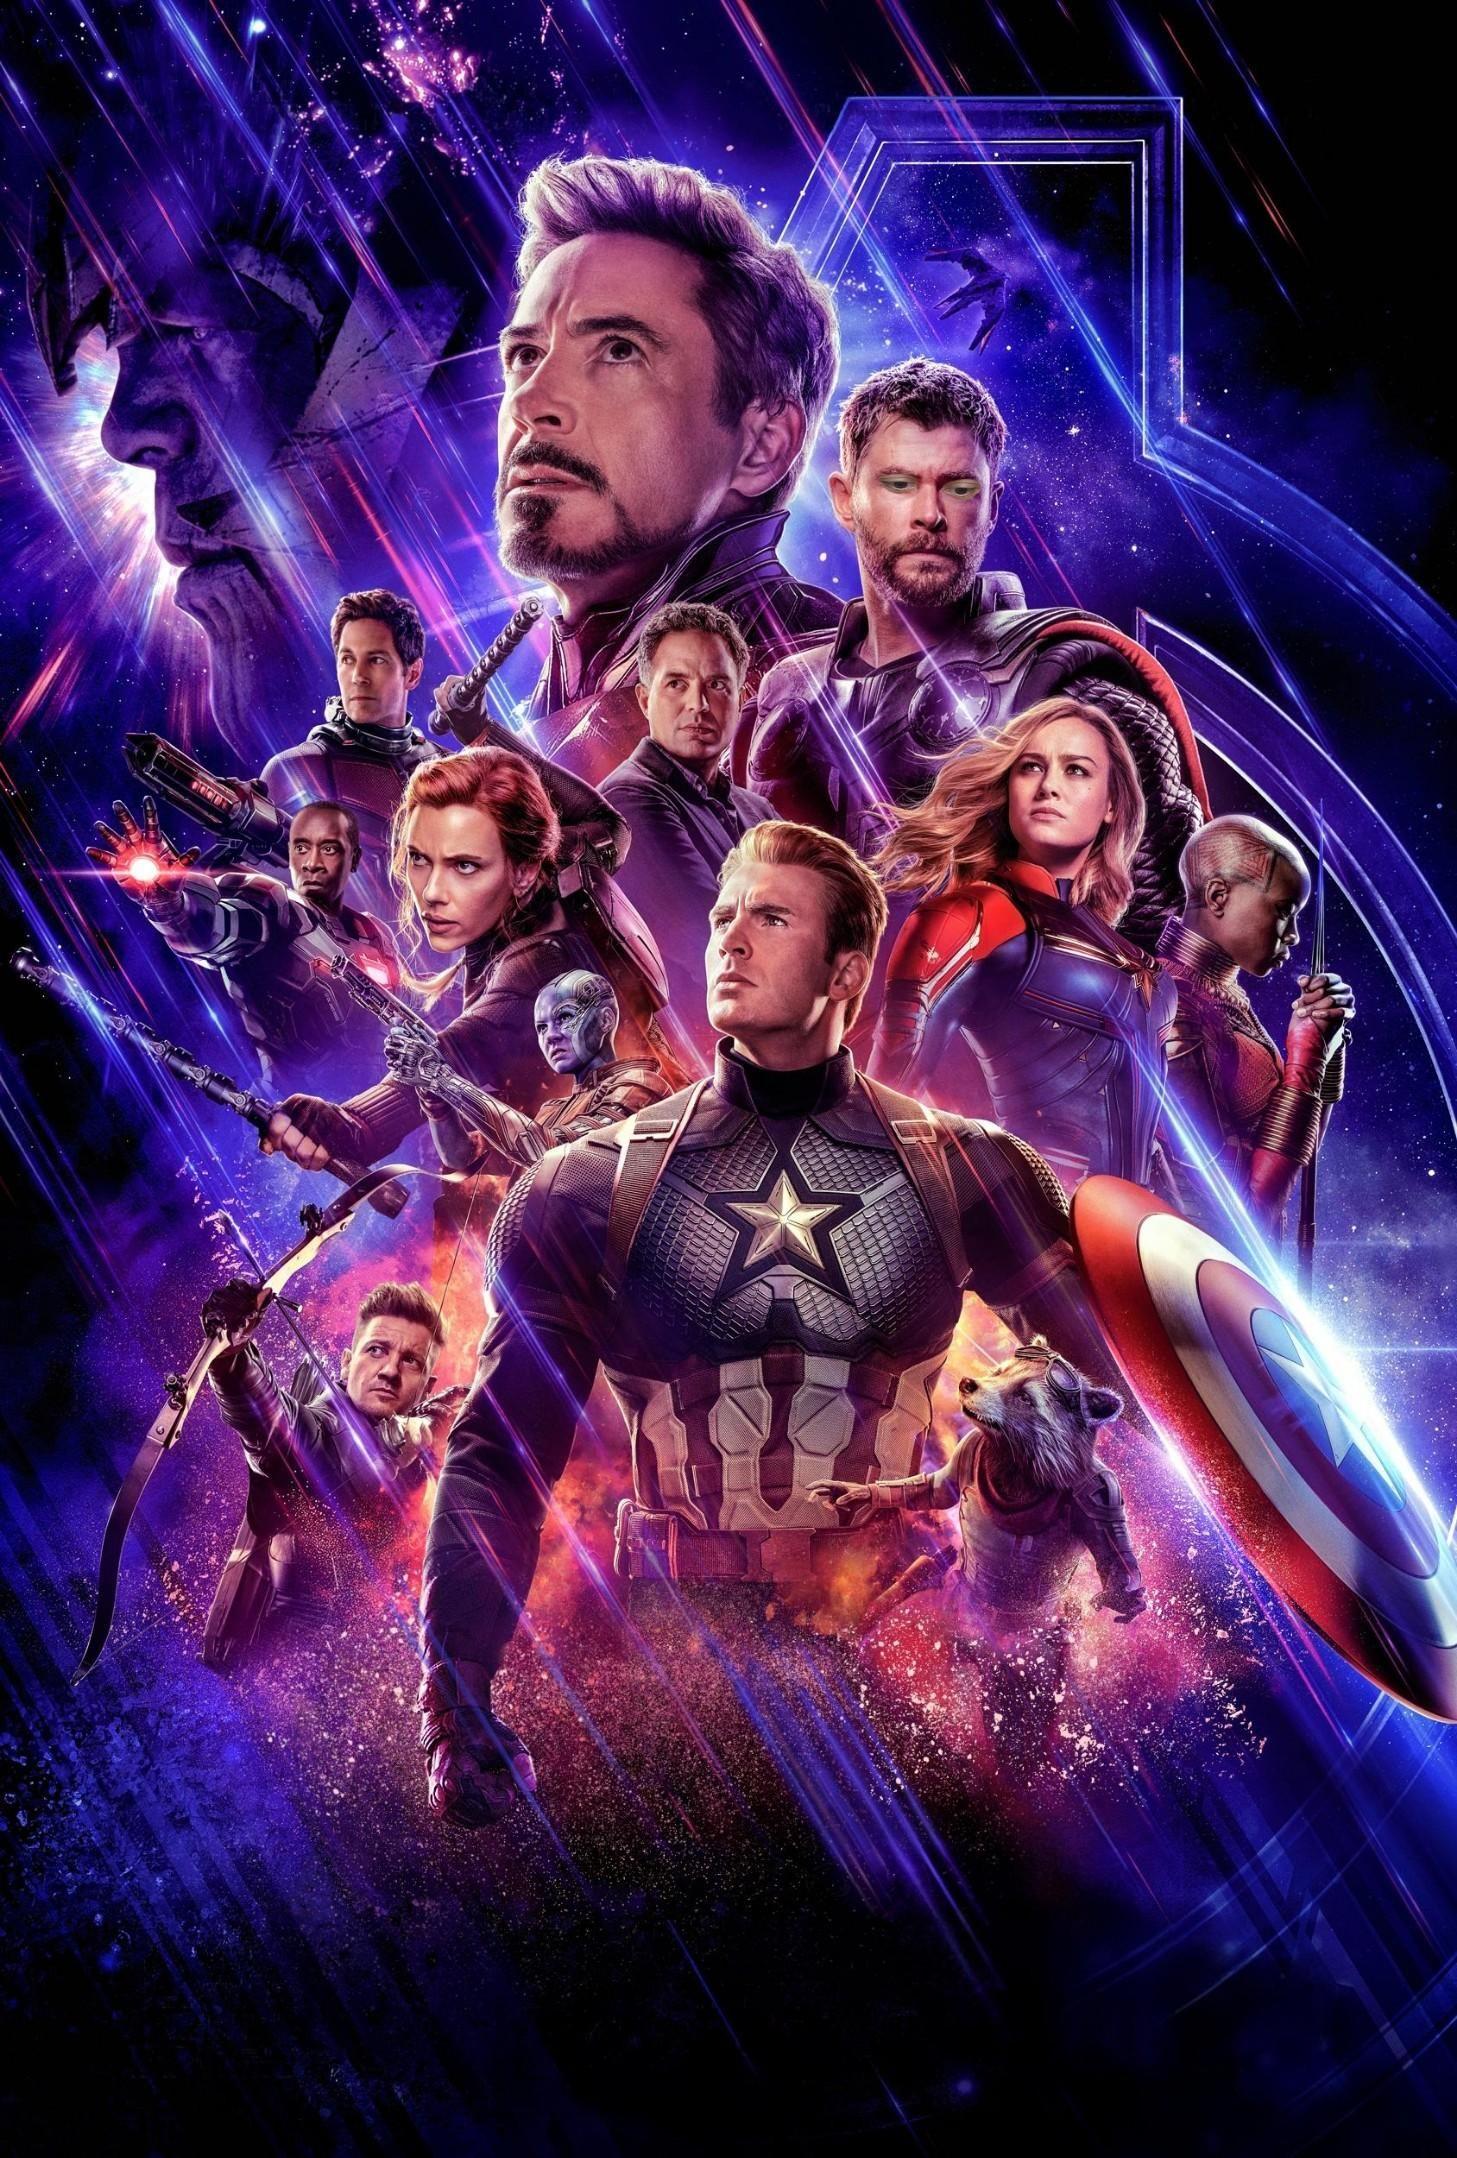 Ooo Wheres Thor Looking At Marvel Marvel Vingadores Vingadores